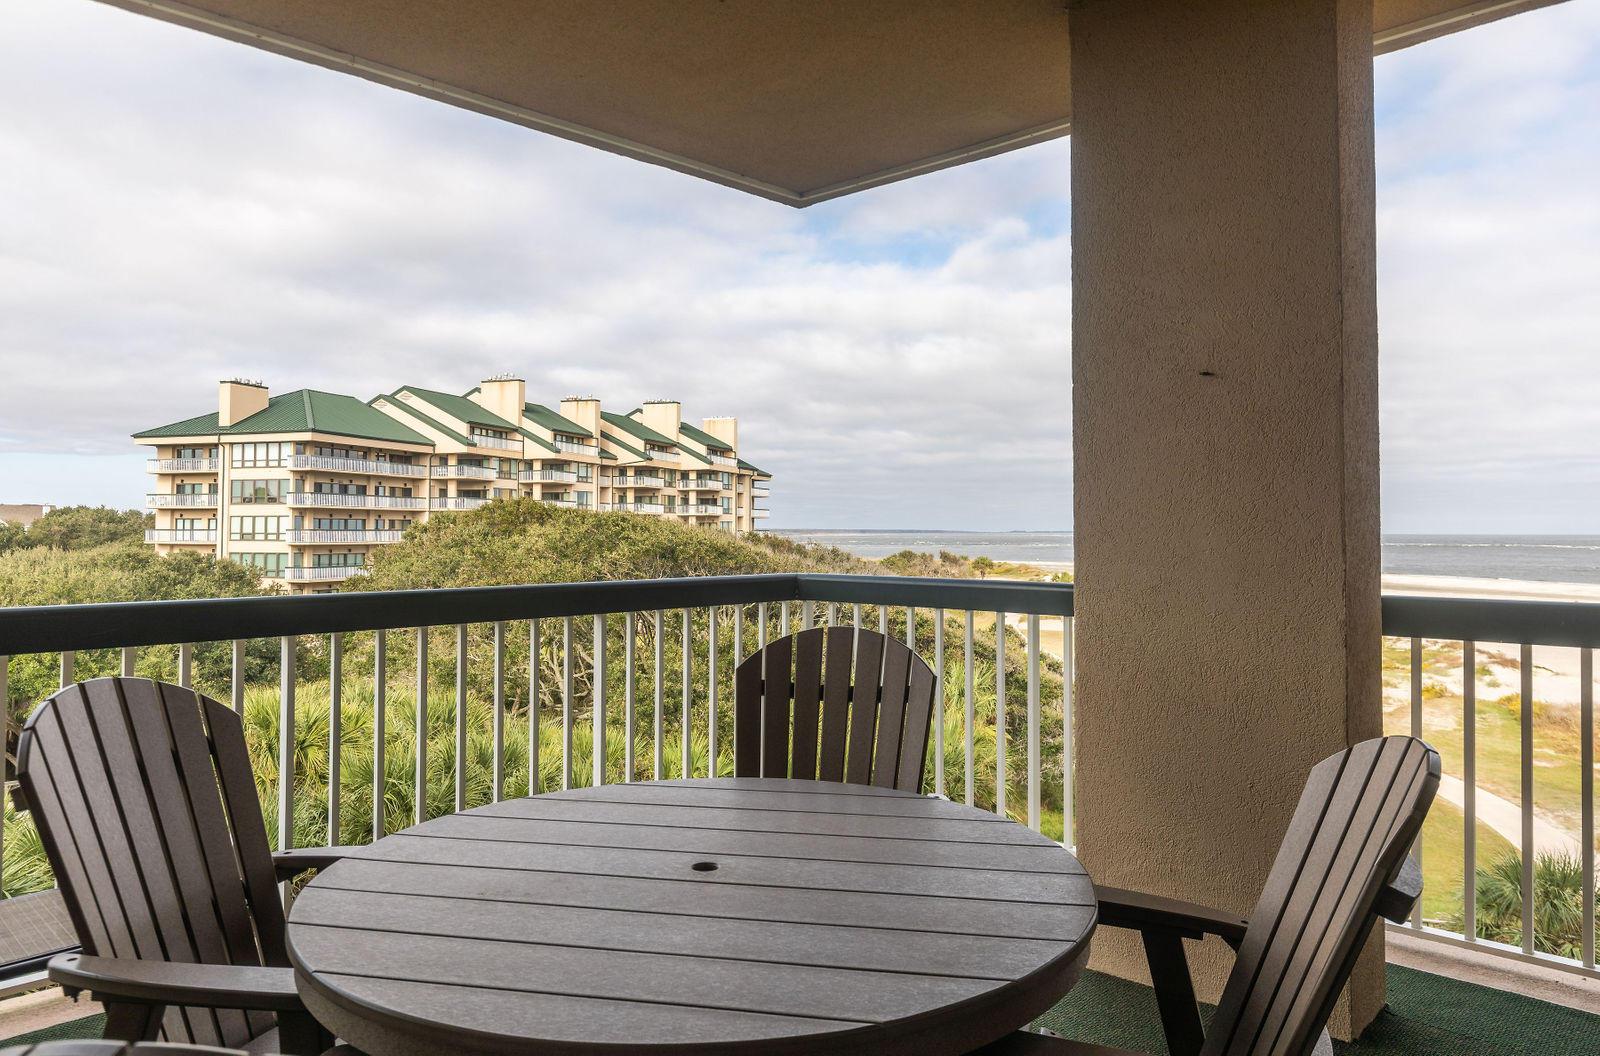 1309 Ocean Club Share Isle Of Palms, SC 29451